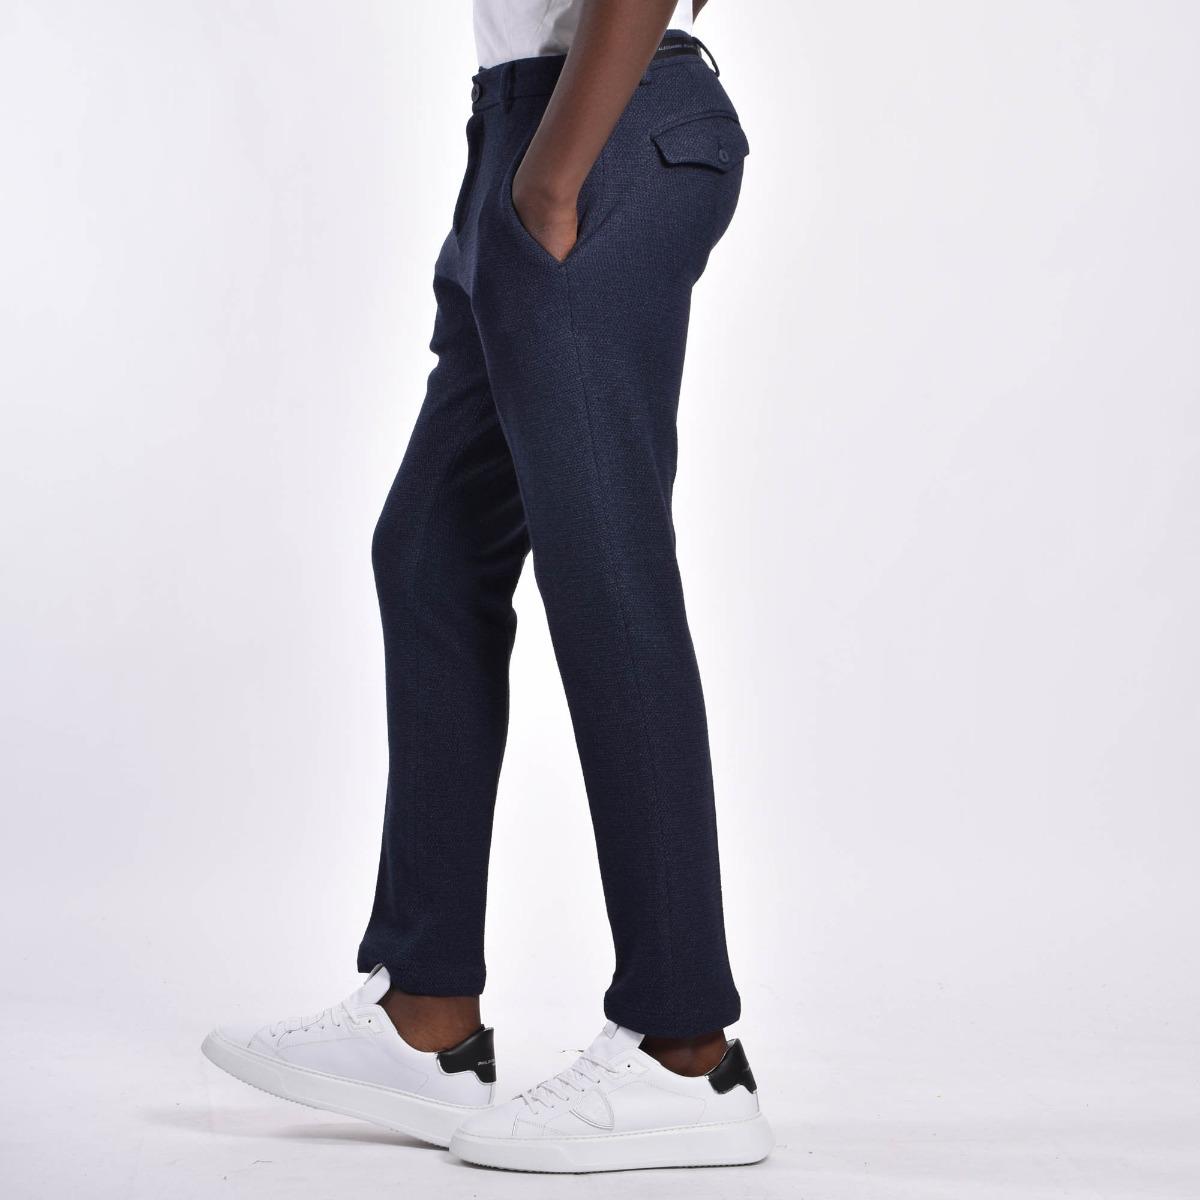 Pantaloni micro fantasia - Blu